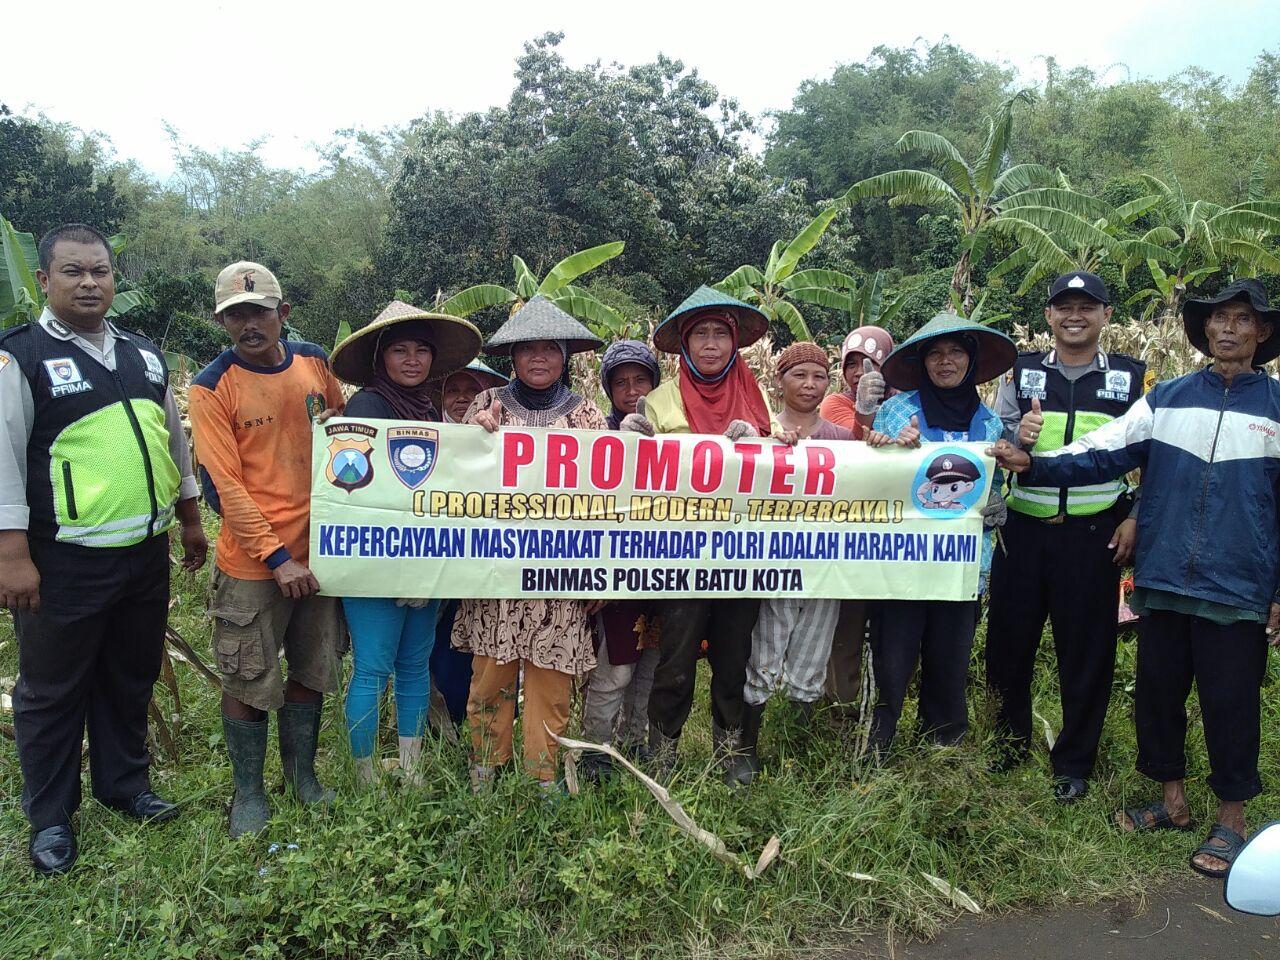 Kegiatan Promoter Binmas Polsek Batu Kota binluh kamtibmas dengan gapoktan jagung hibrida.